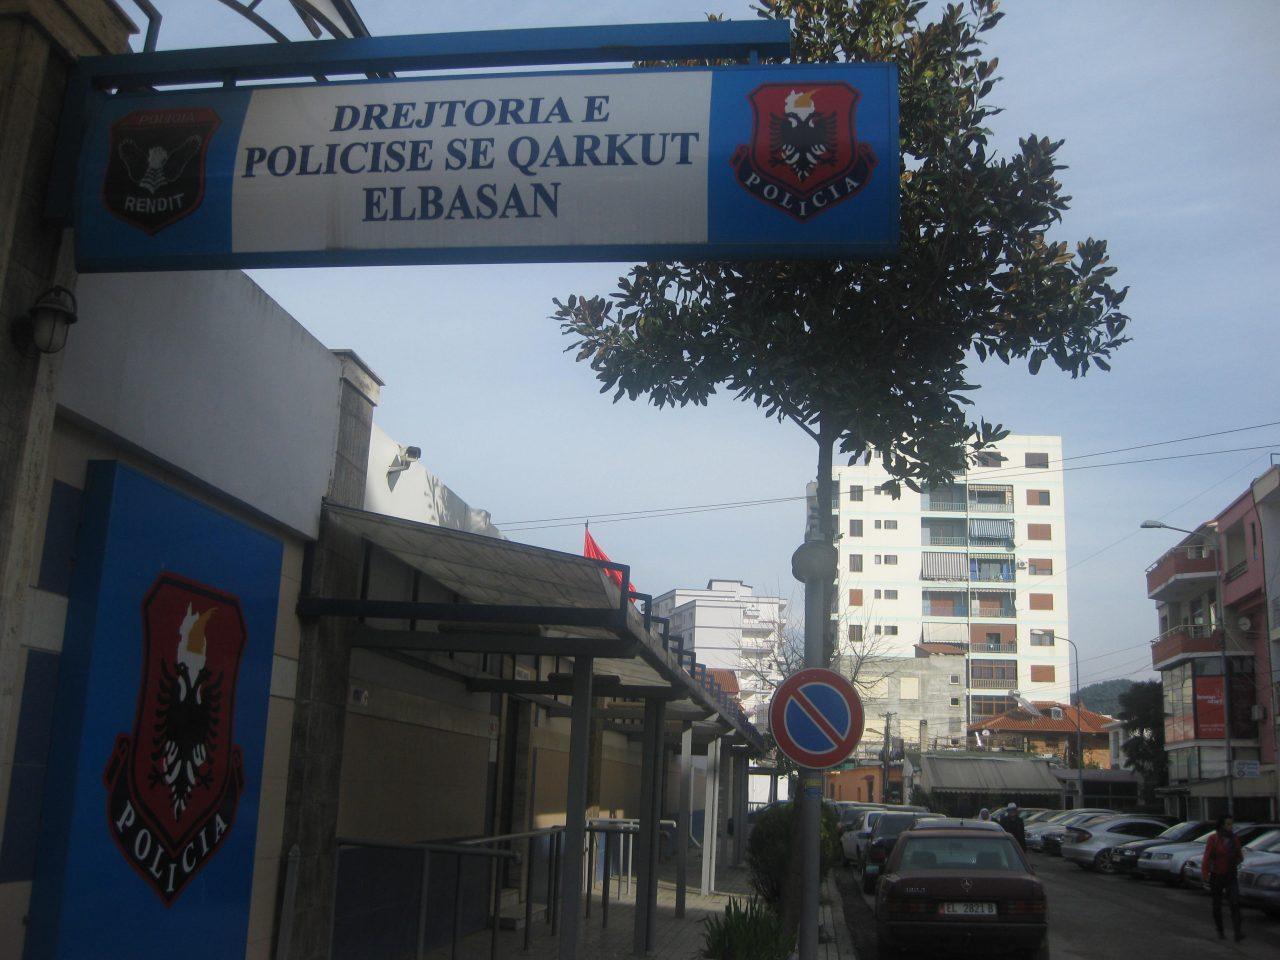 POLICIA-ELBASAN-1280x960.jpg